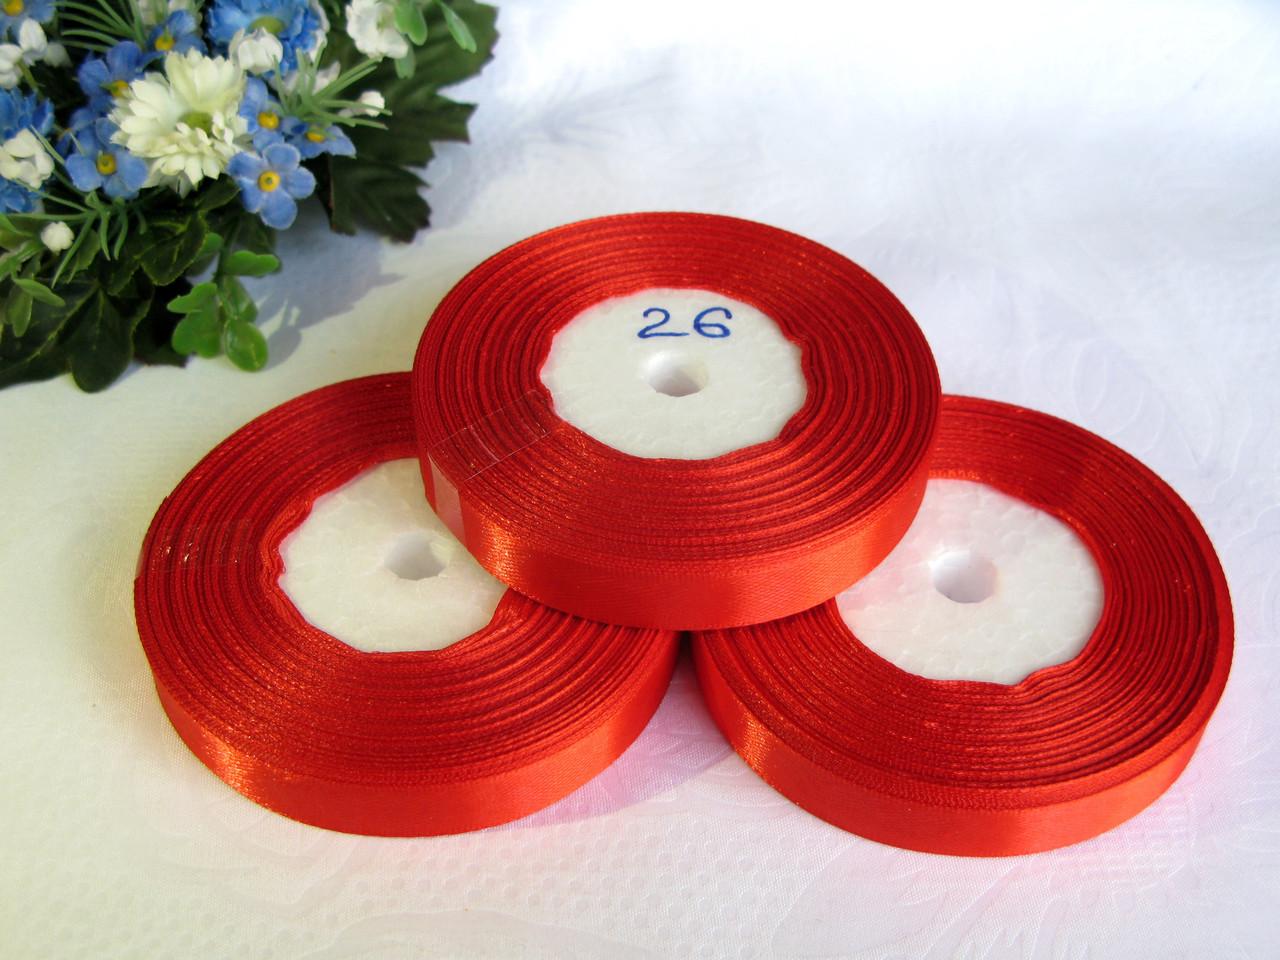 Атласная лента 1.2 см цвет - красный (26)  бобина 23 м